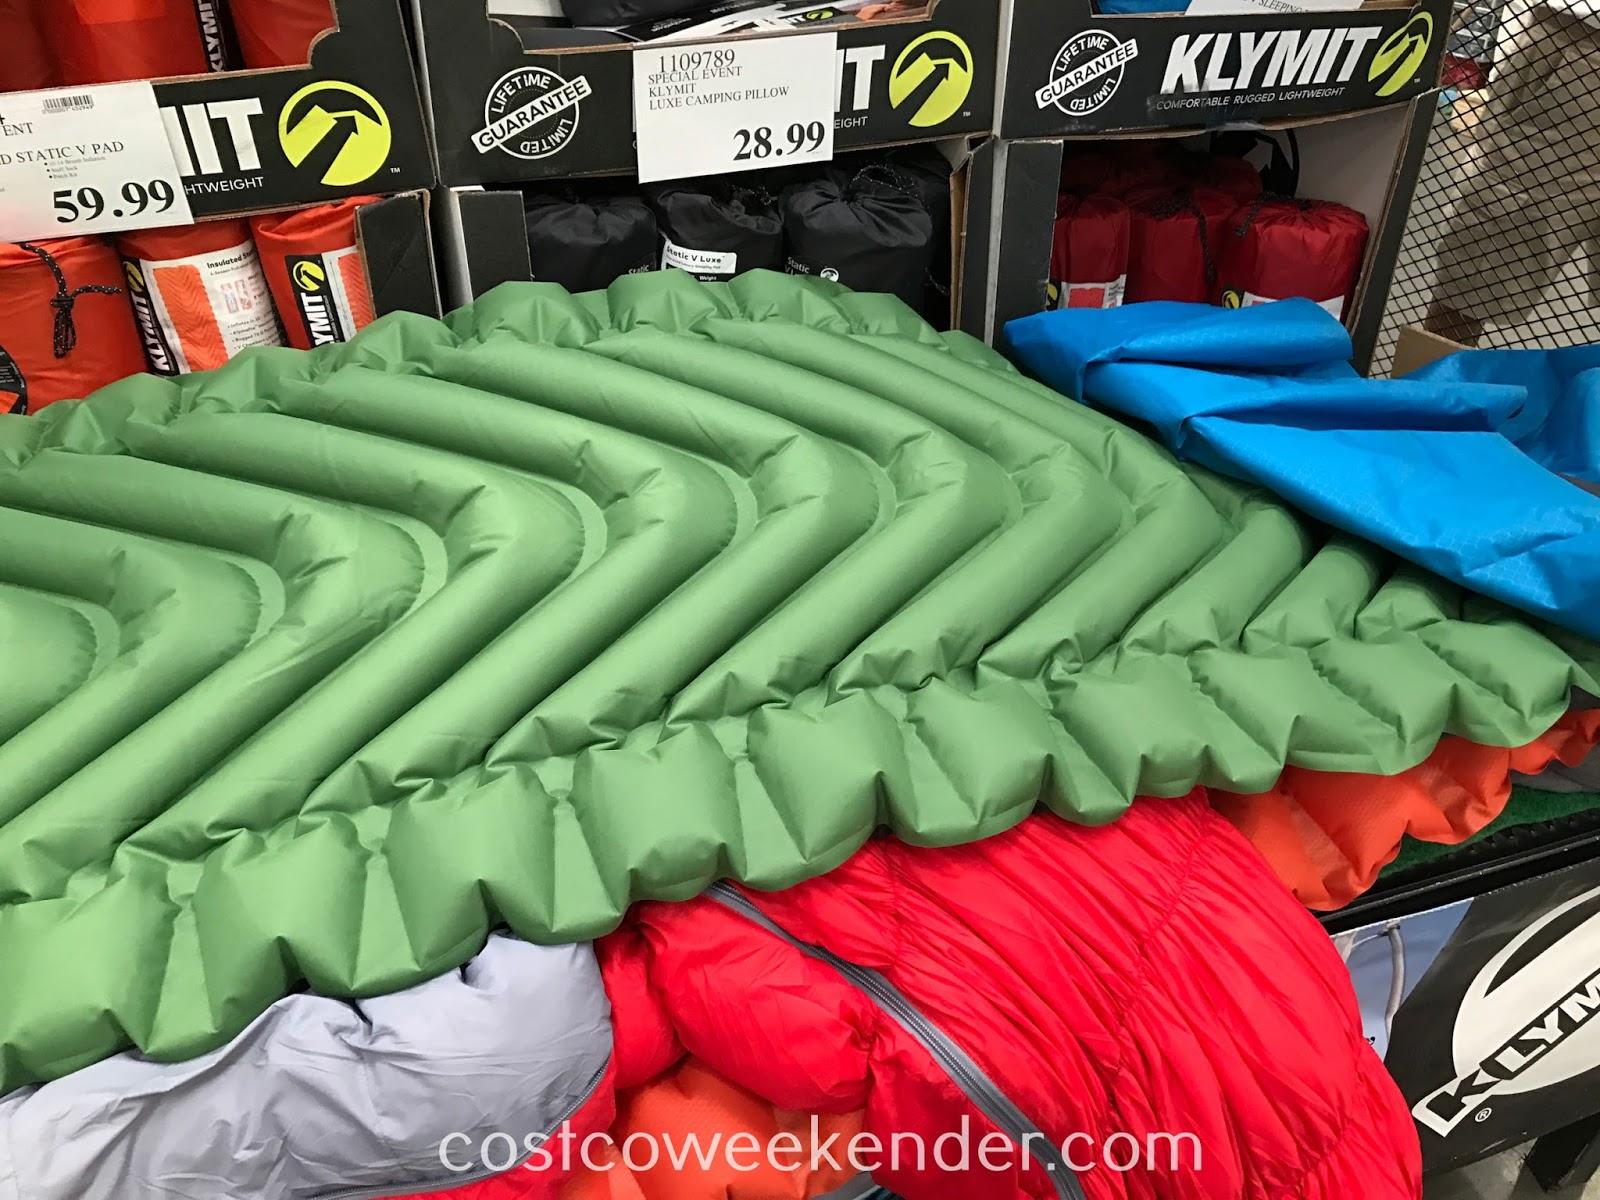 Klymit Static V Full Sized Lightweight Sleeping Pad